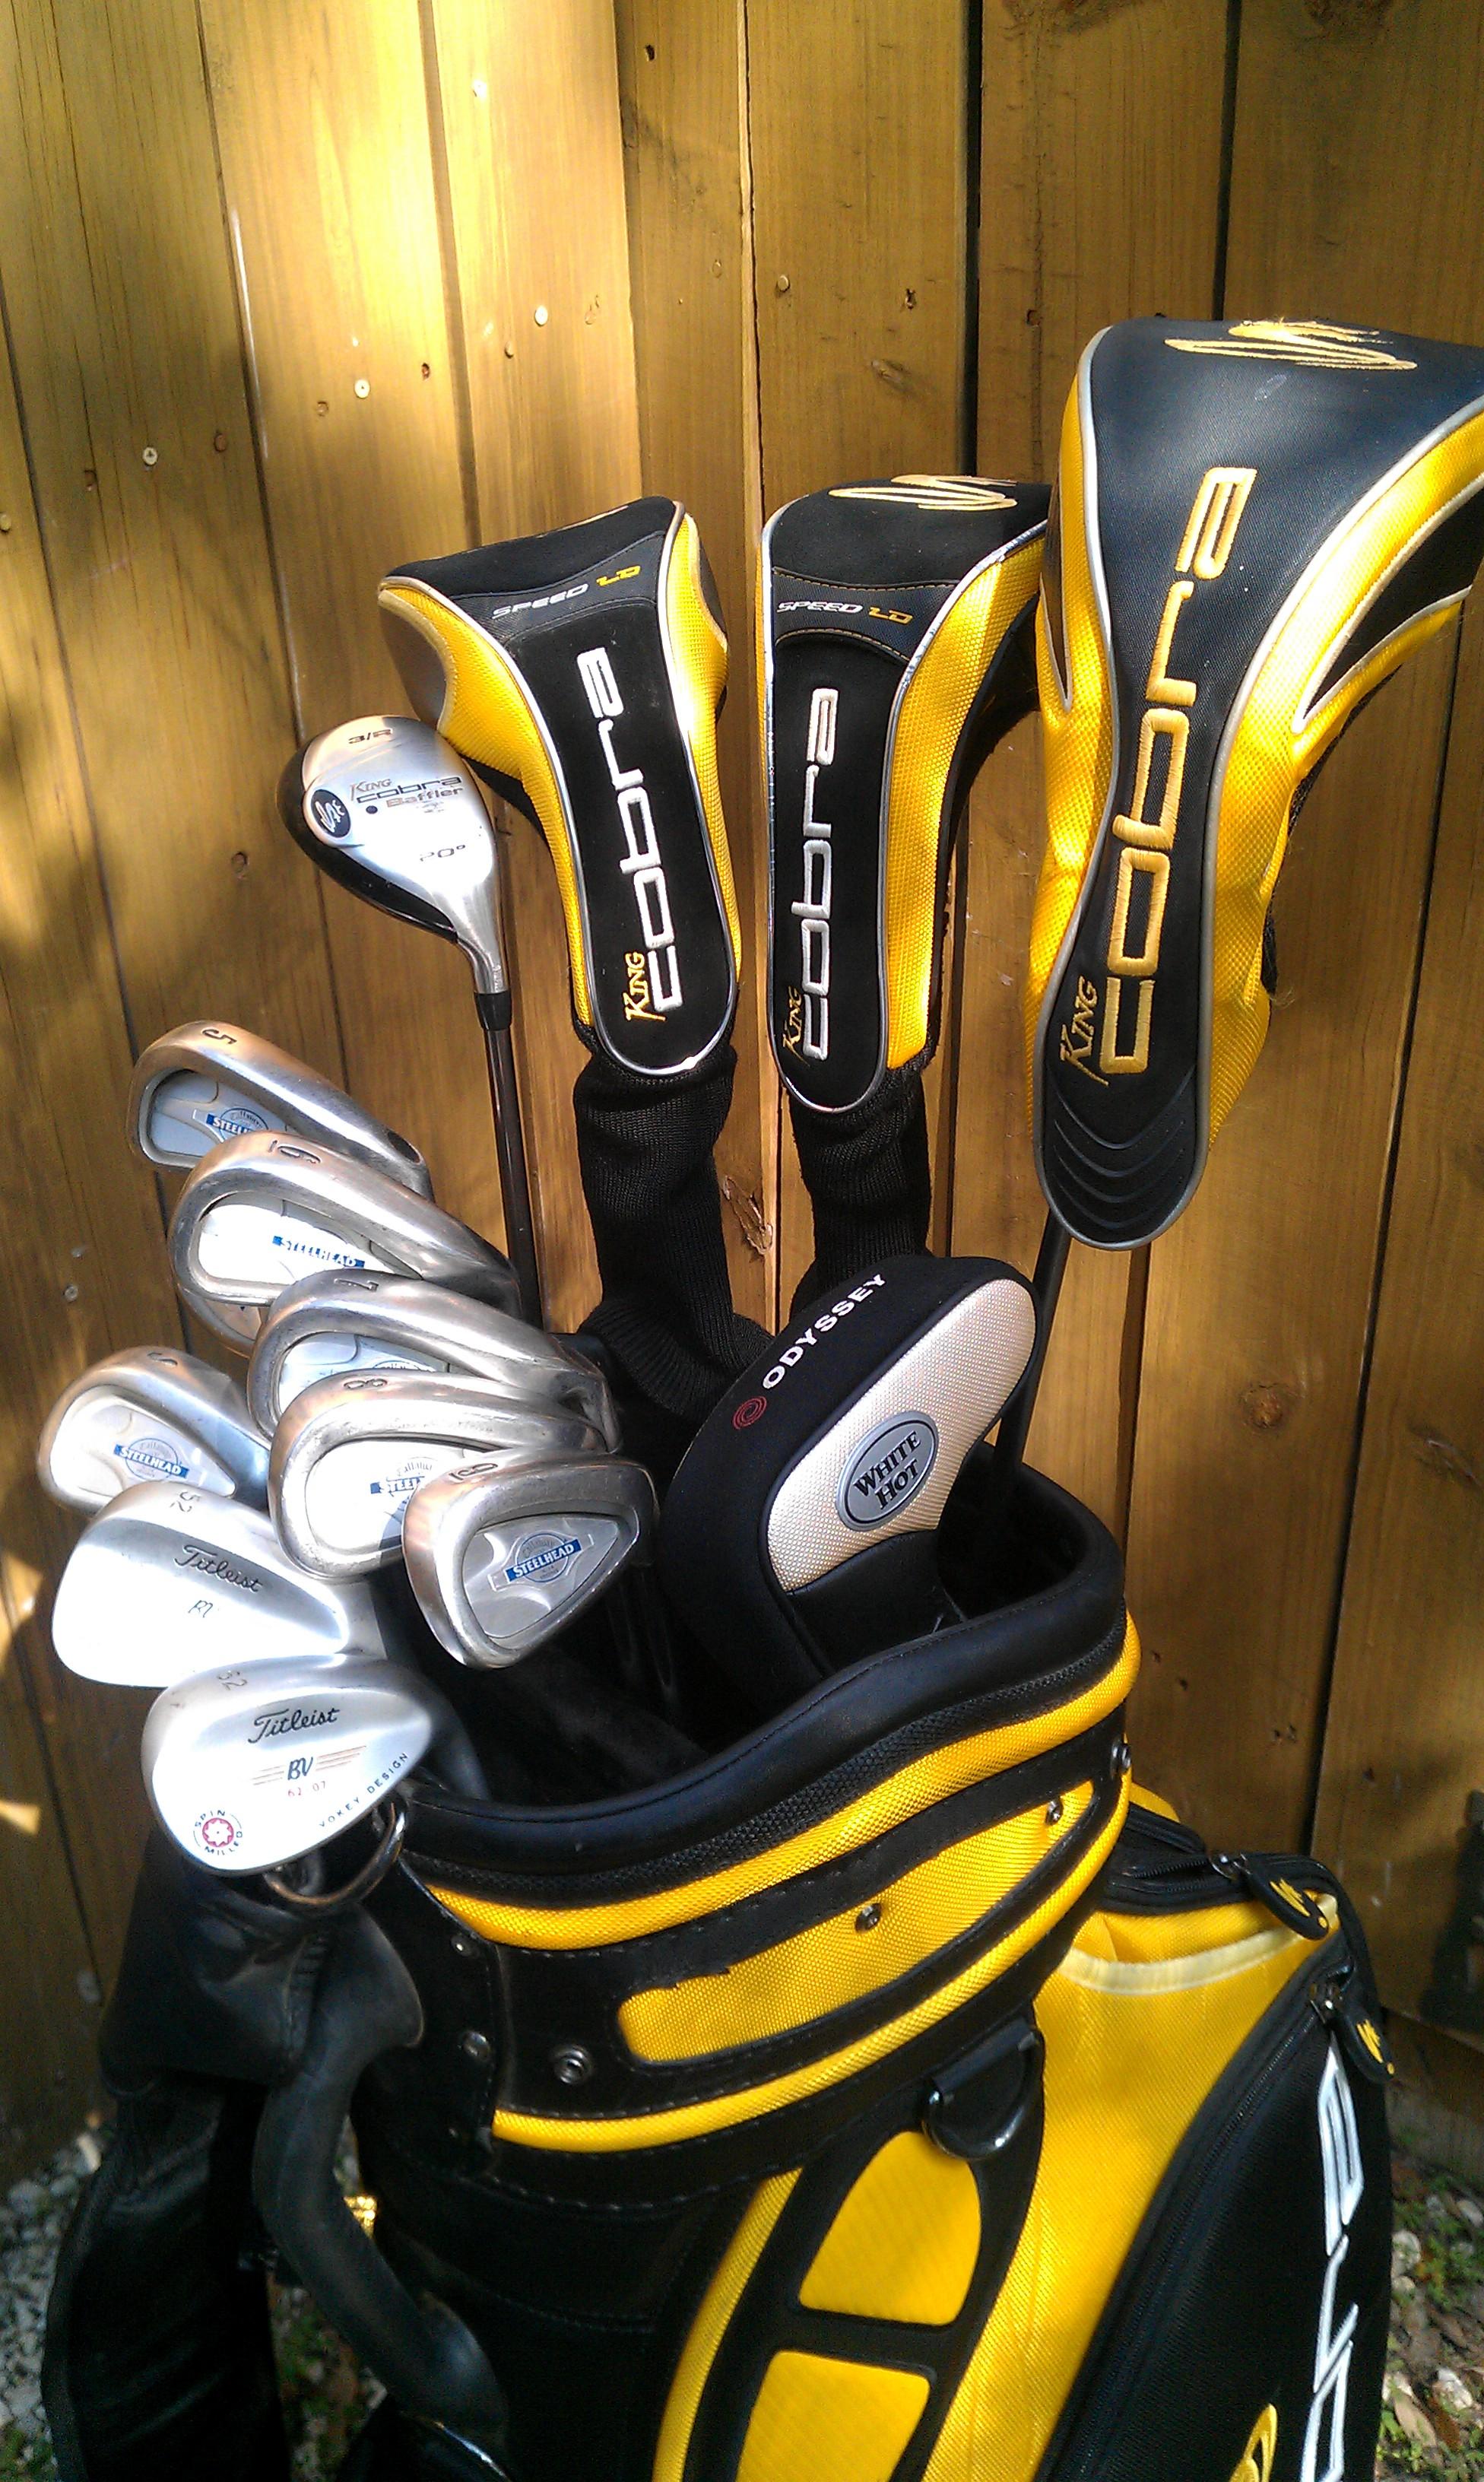 Callaway Golf Clubs >> Loanables Cobra Callaway Golf Clubs Rental Located In Austin Tx